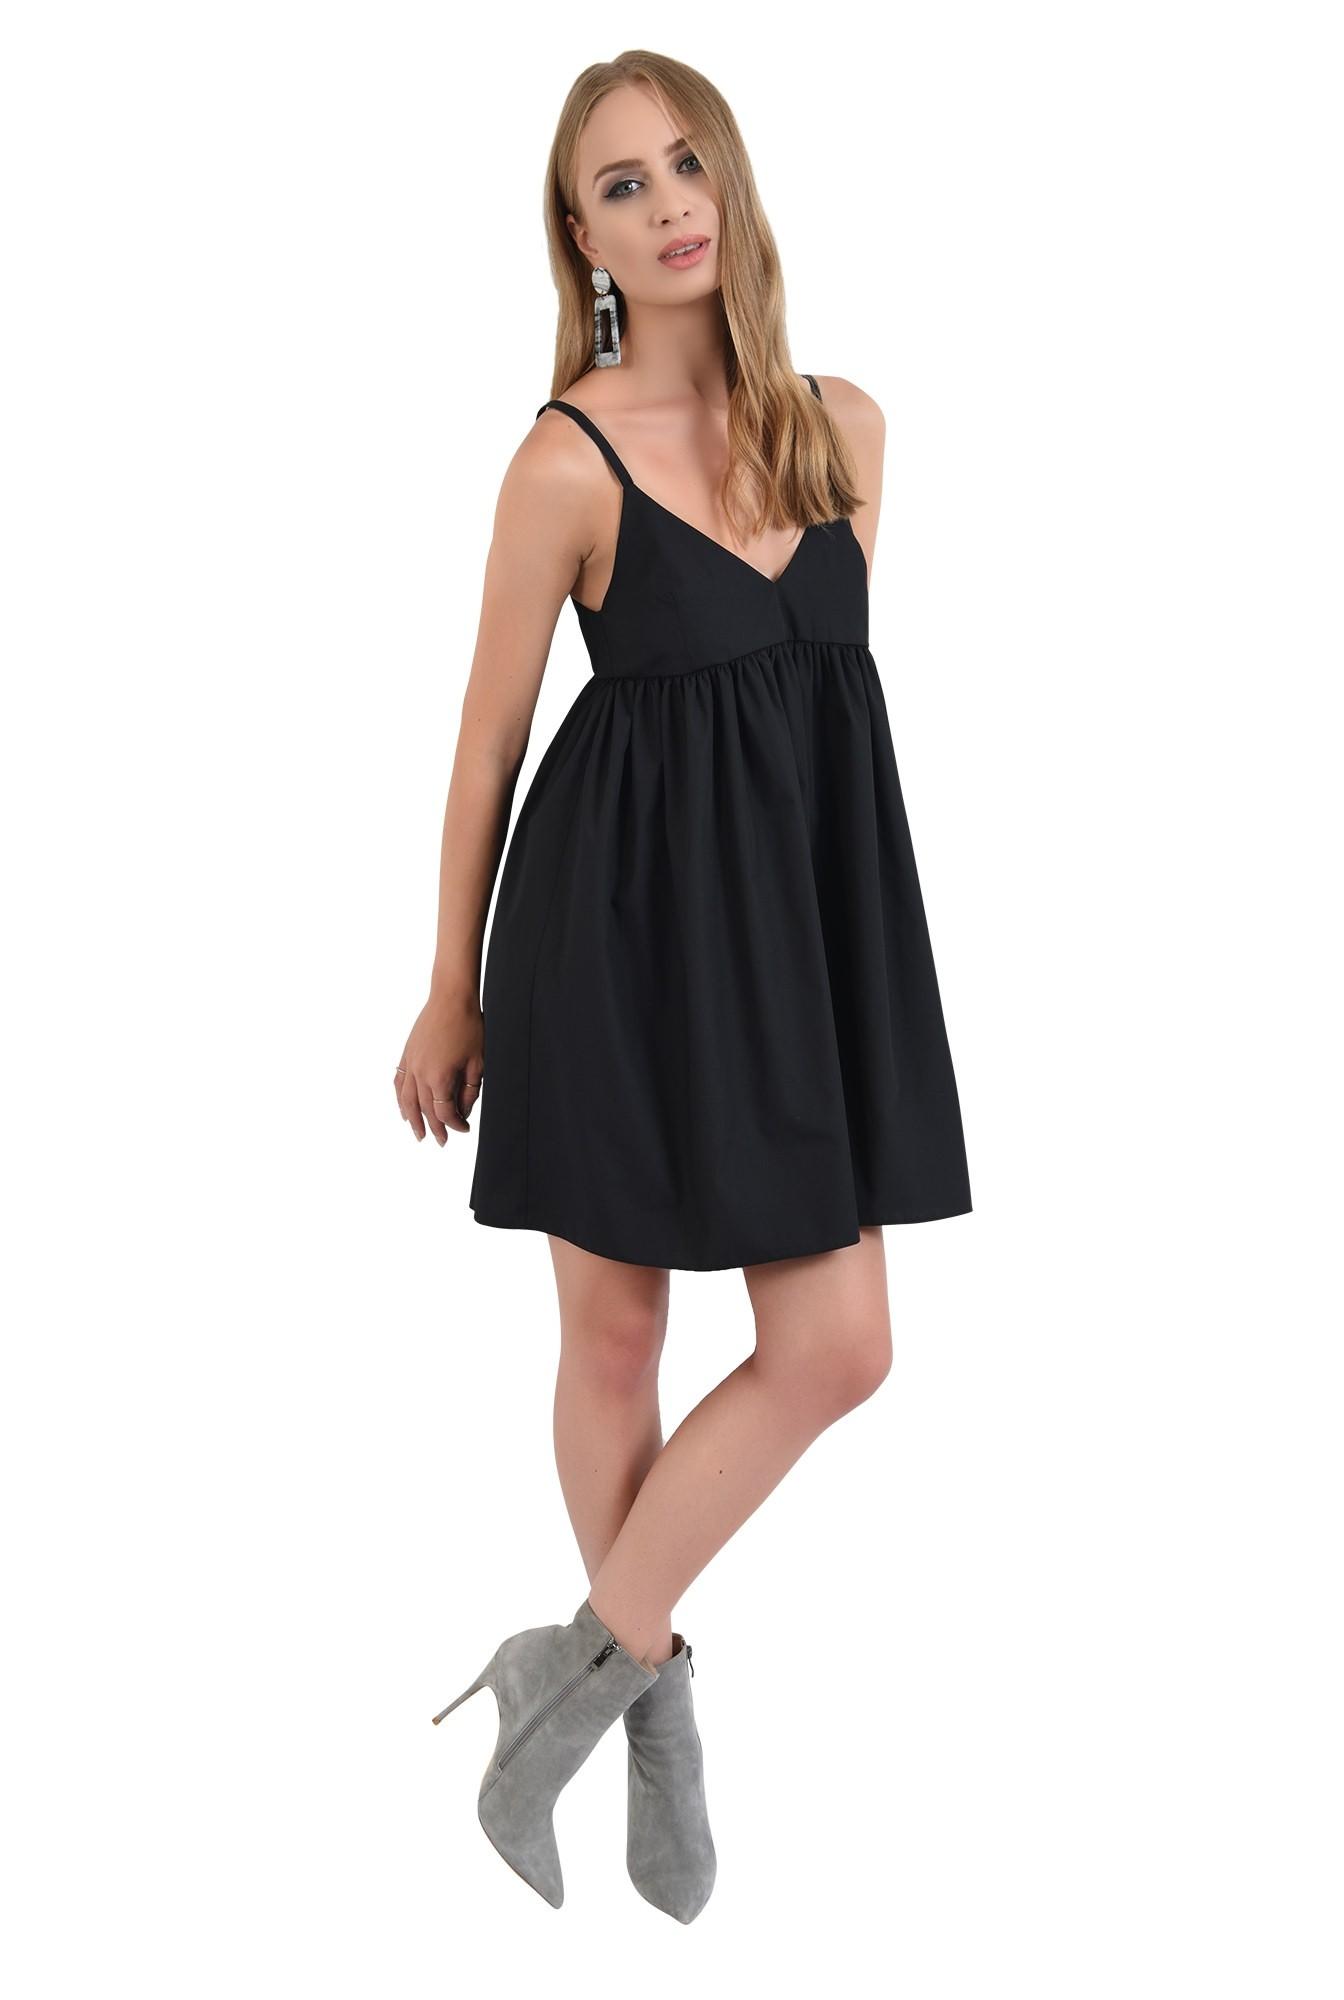 3 - 360 - rochie neagra, mini, evazata, cu bretele, anchior